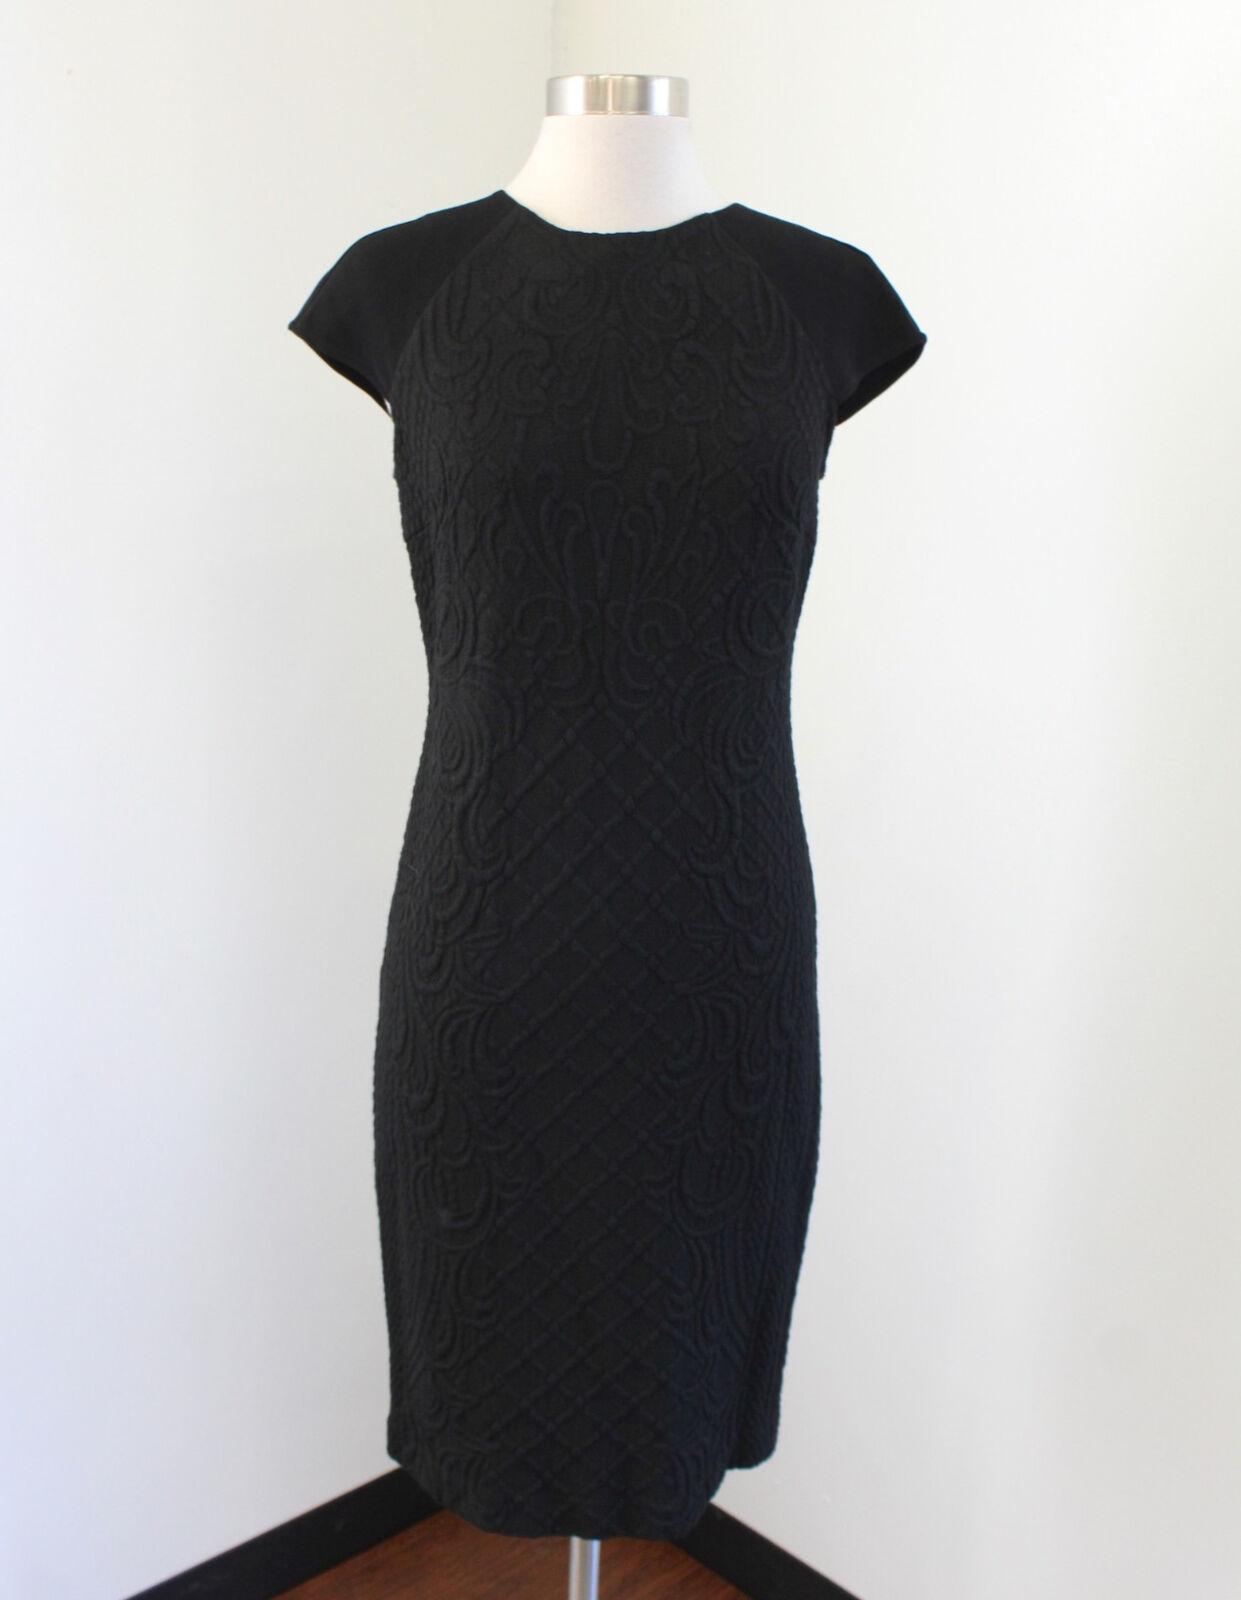 Tory Burch Kiersten schwarz Embossed Quilted Dress Größe S Cap Sleeve Wool